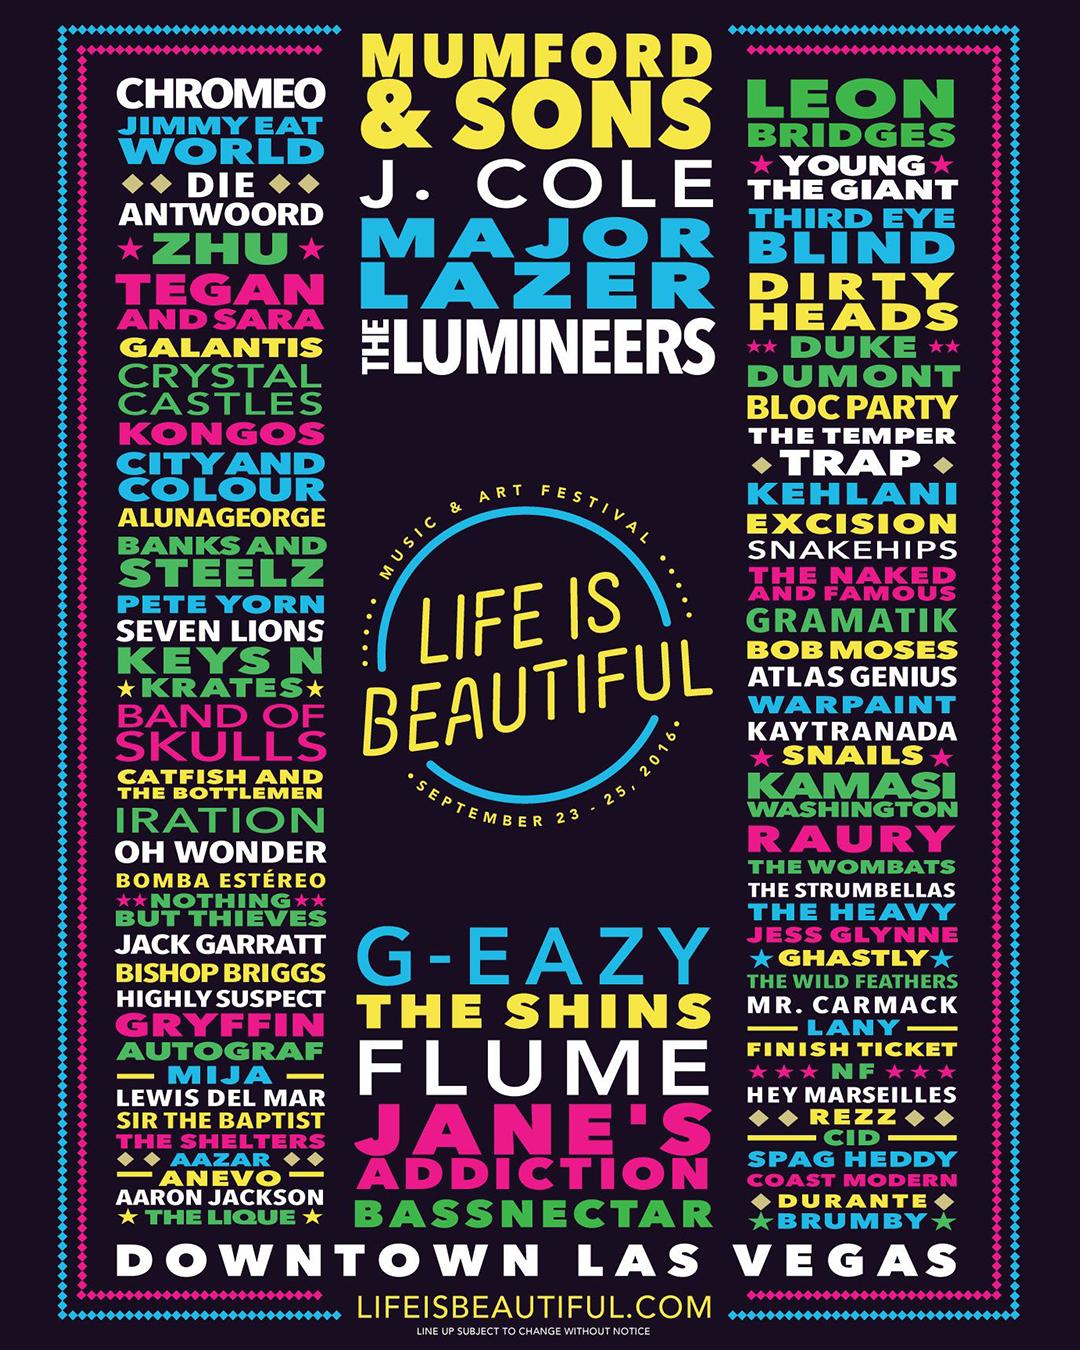 Life Is Beautiful Festival 2020.Life Is Beautiful Music Art Festival